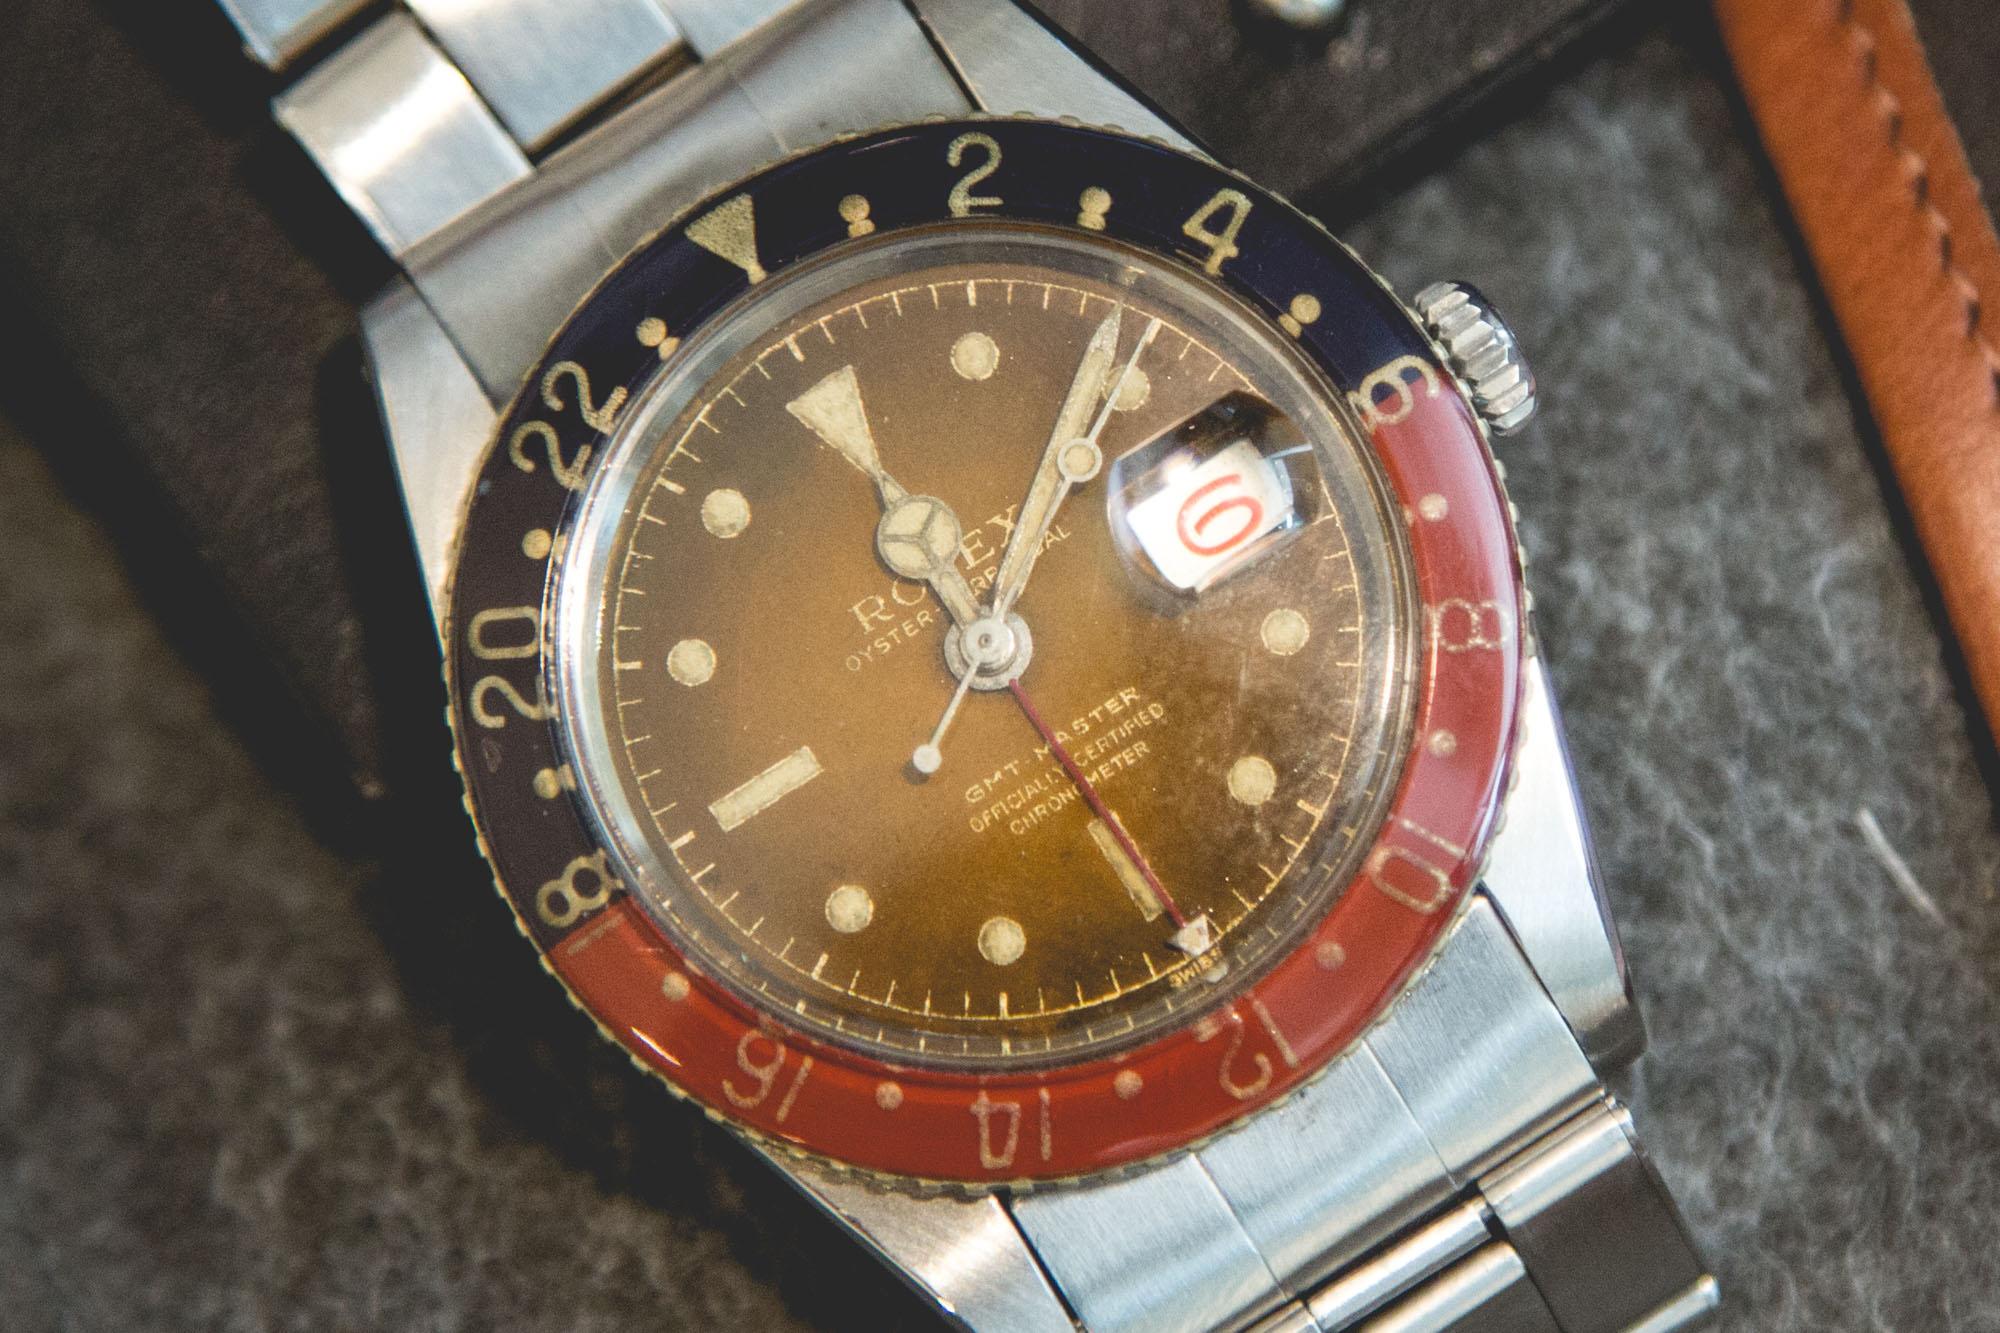 Rolex Gmt-Master référence 6542